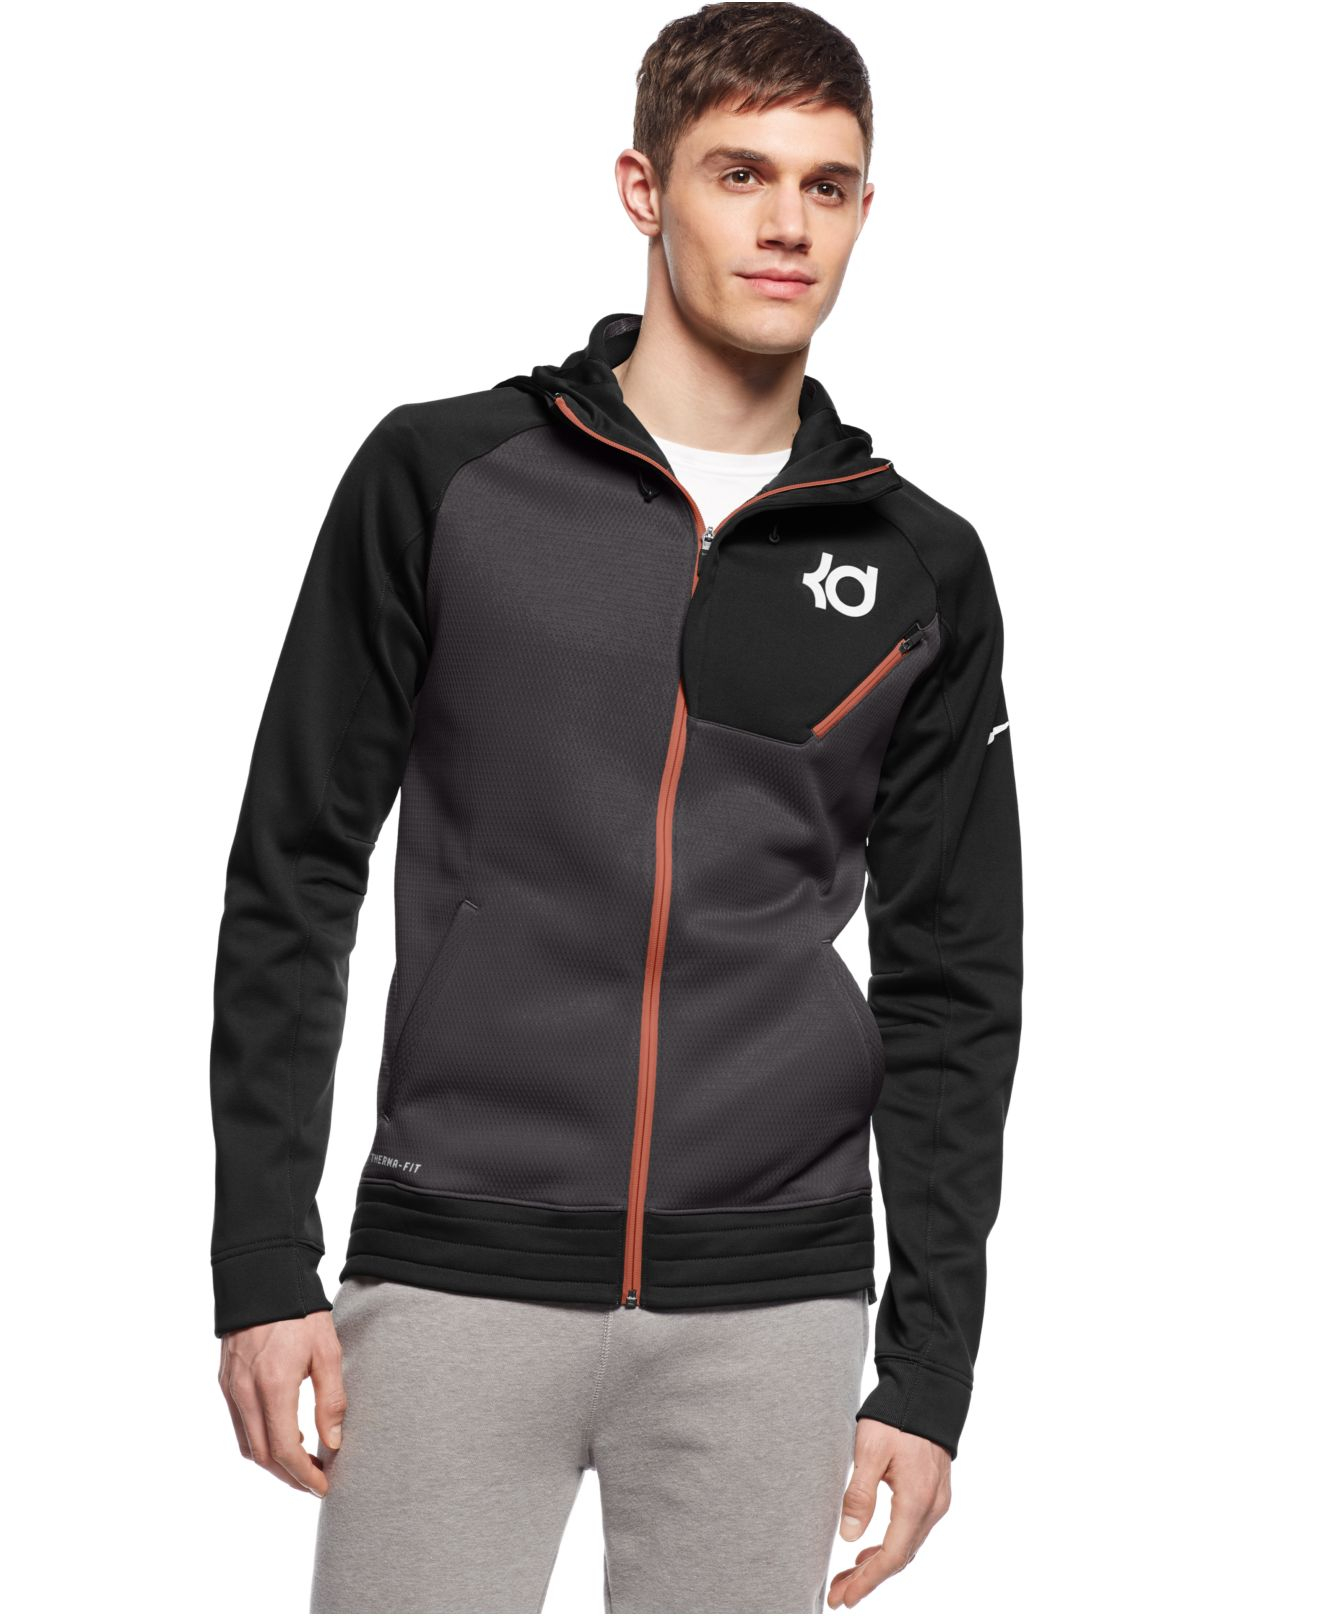 50ef7e5f0f Nike Black Kd Surge Elite Performance Full-zip Hoodie for men